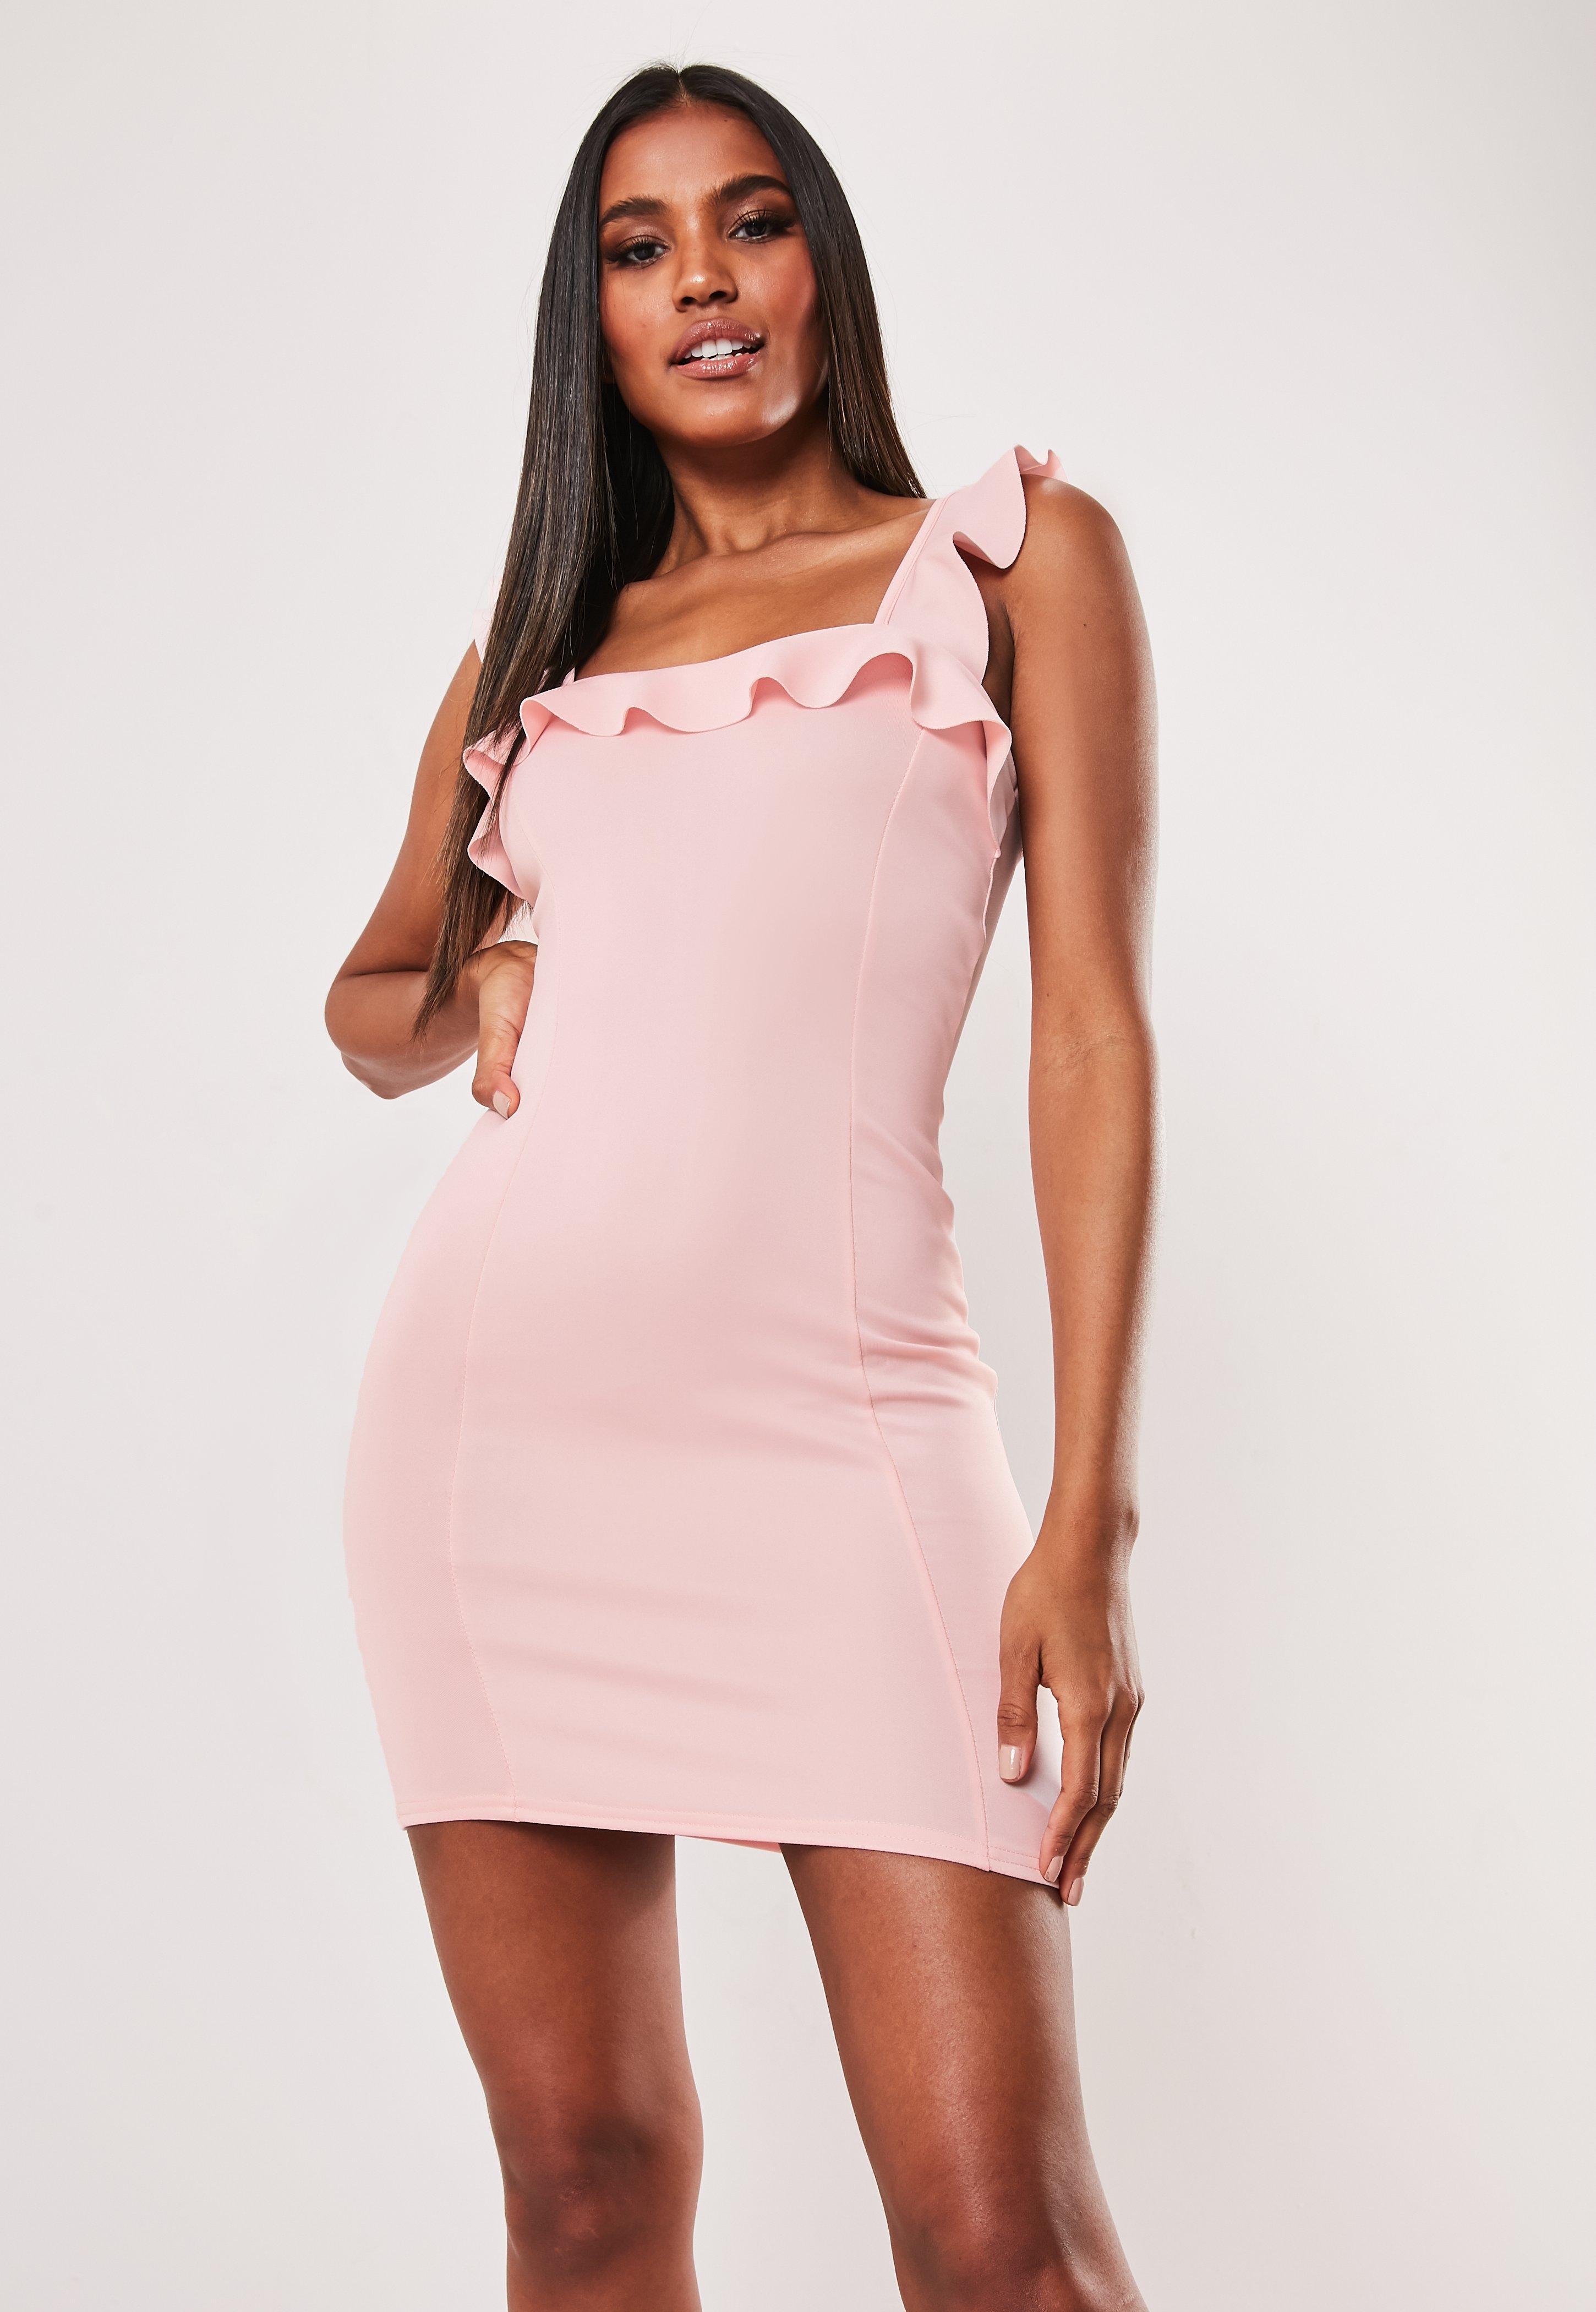 d0ac0bd7 Club Dresses   Club Outfits & Nightclub Dresses - Missguided